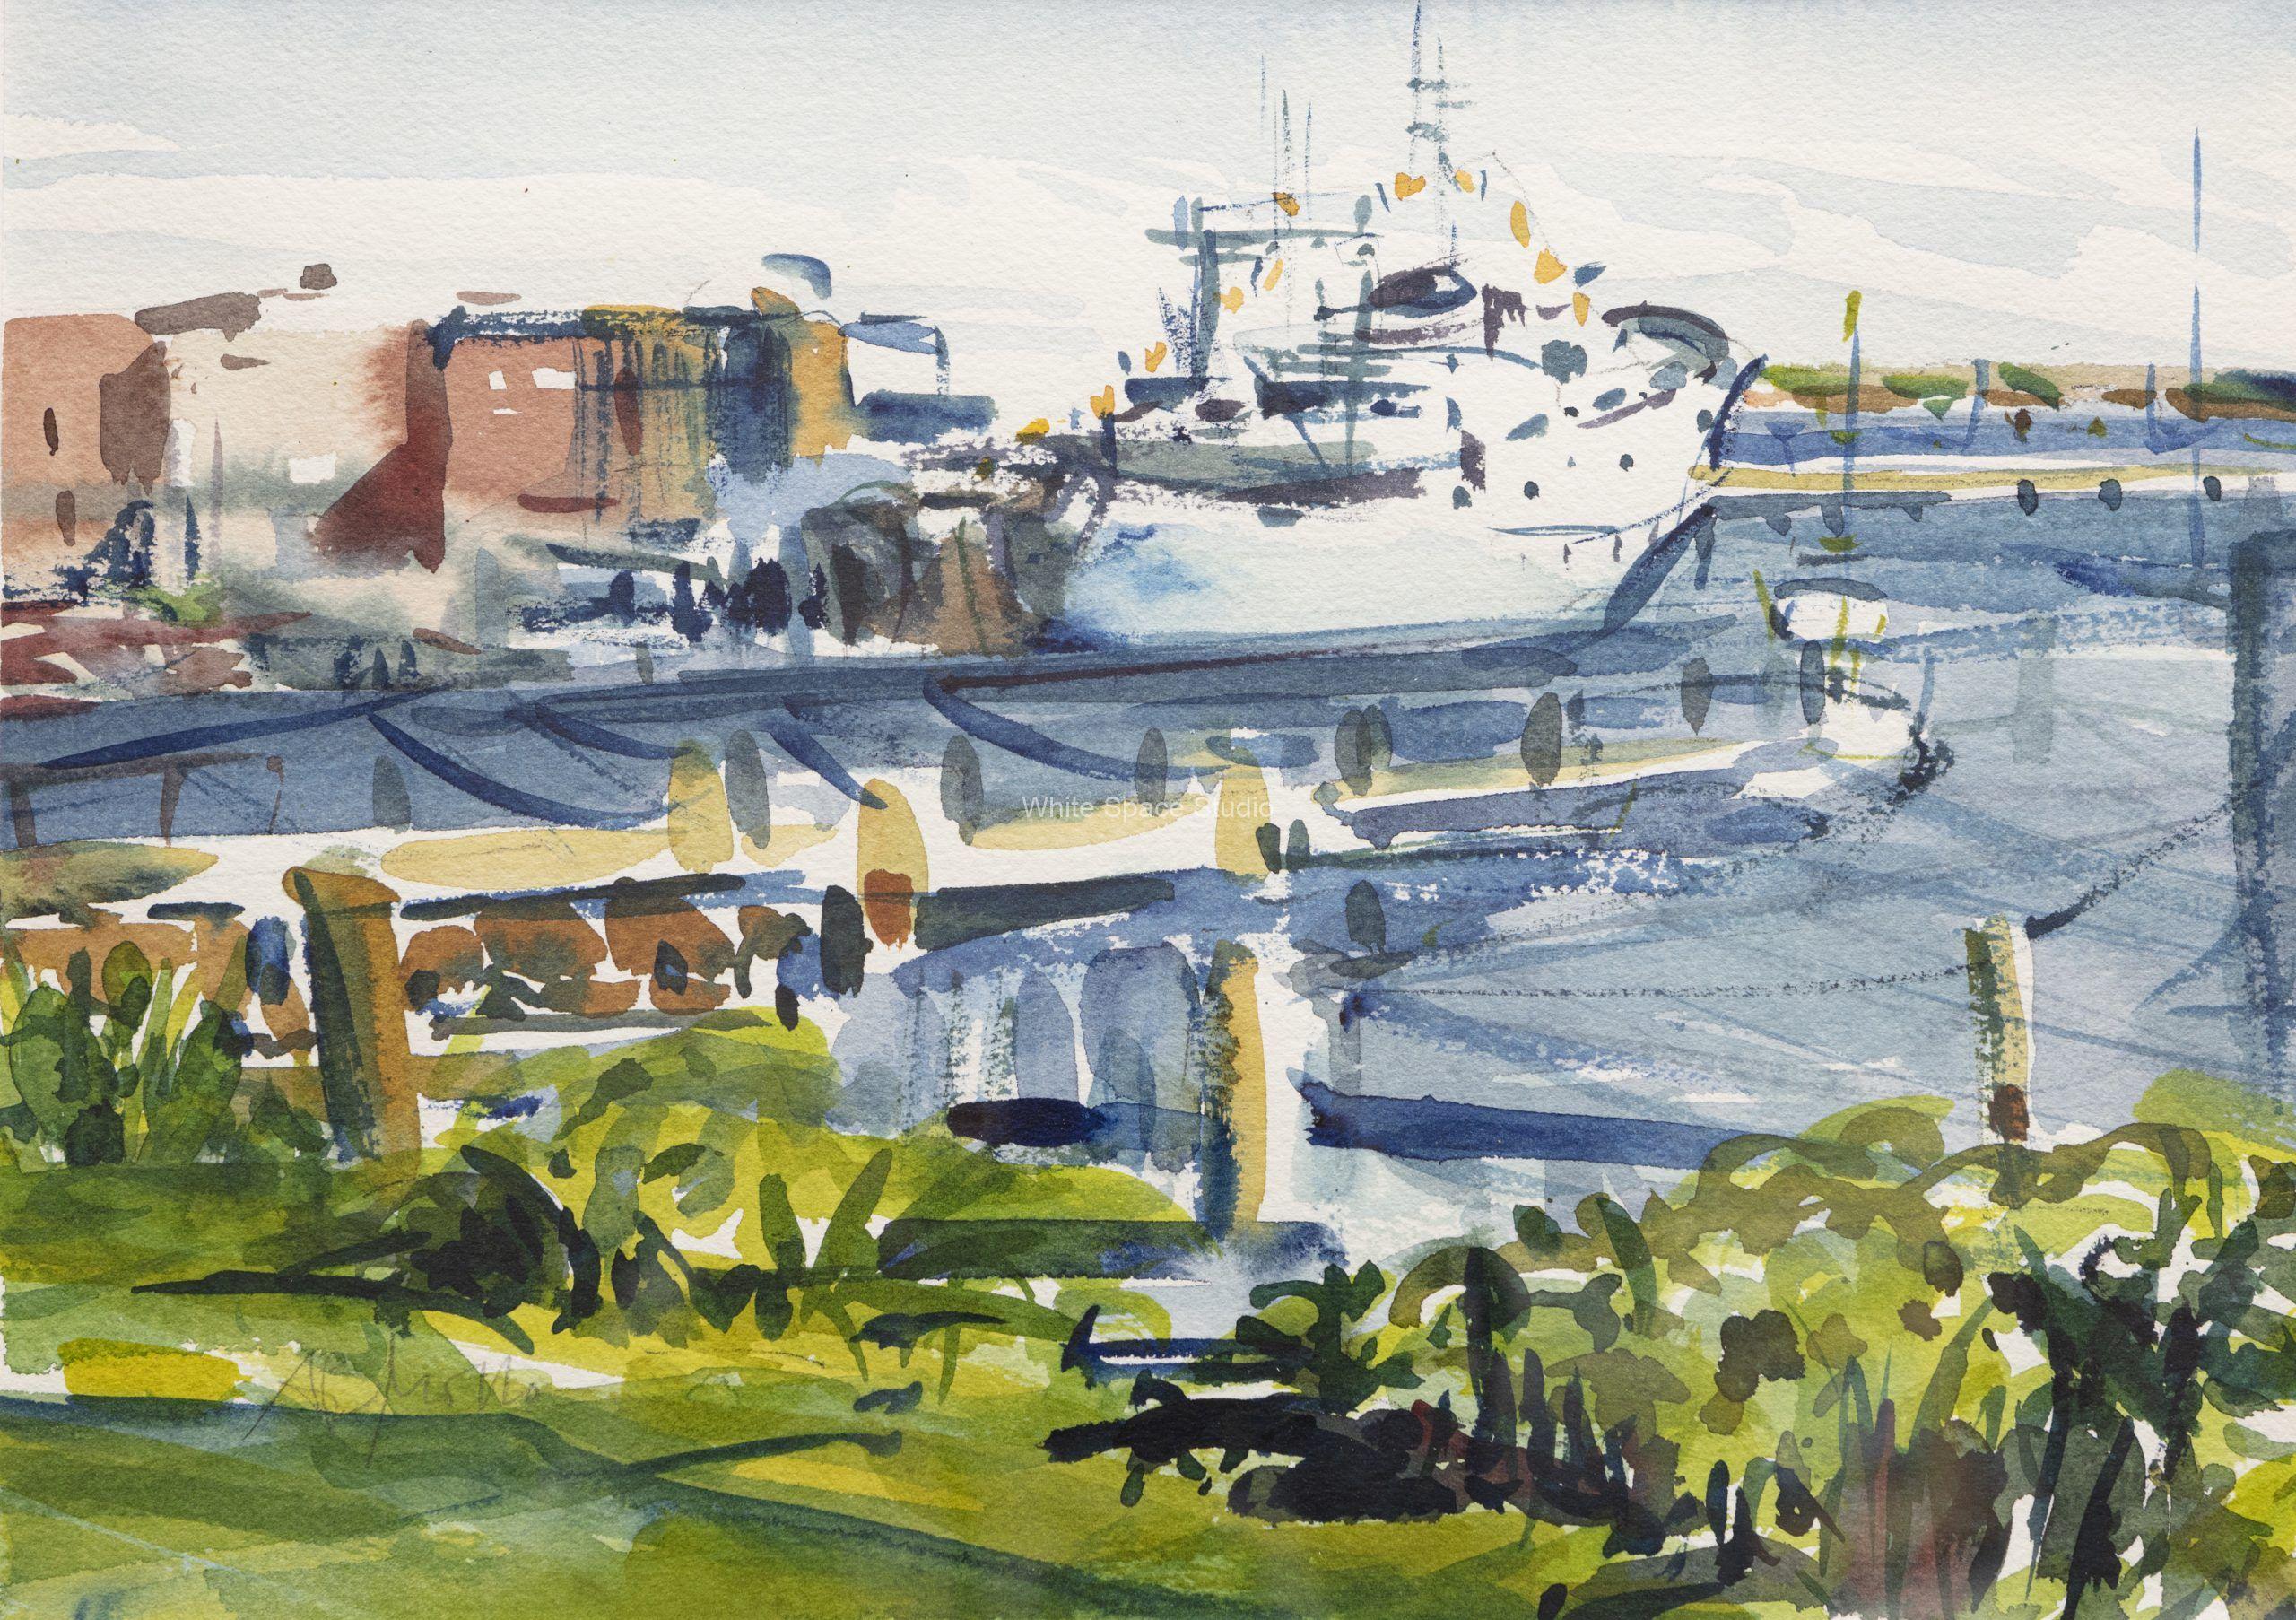 Woods Hole Research Vessel Arlene Black Mollo Watercolor Artwork